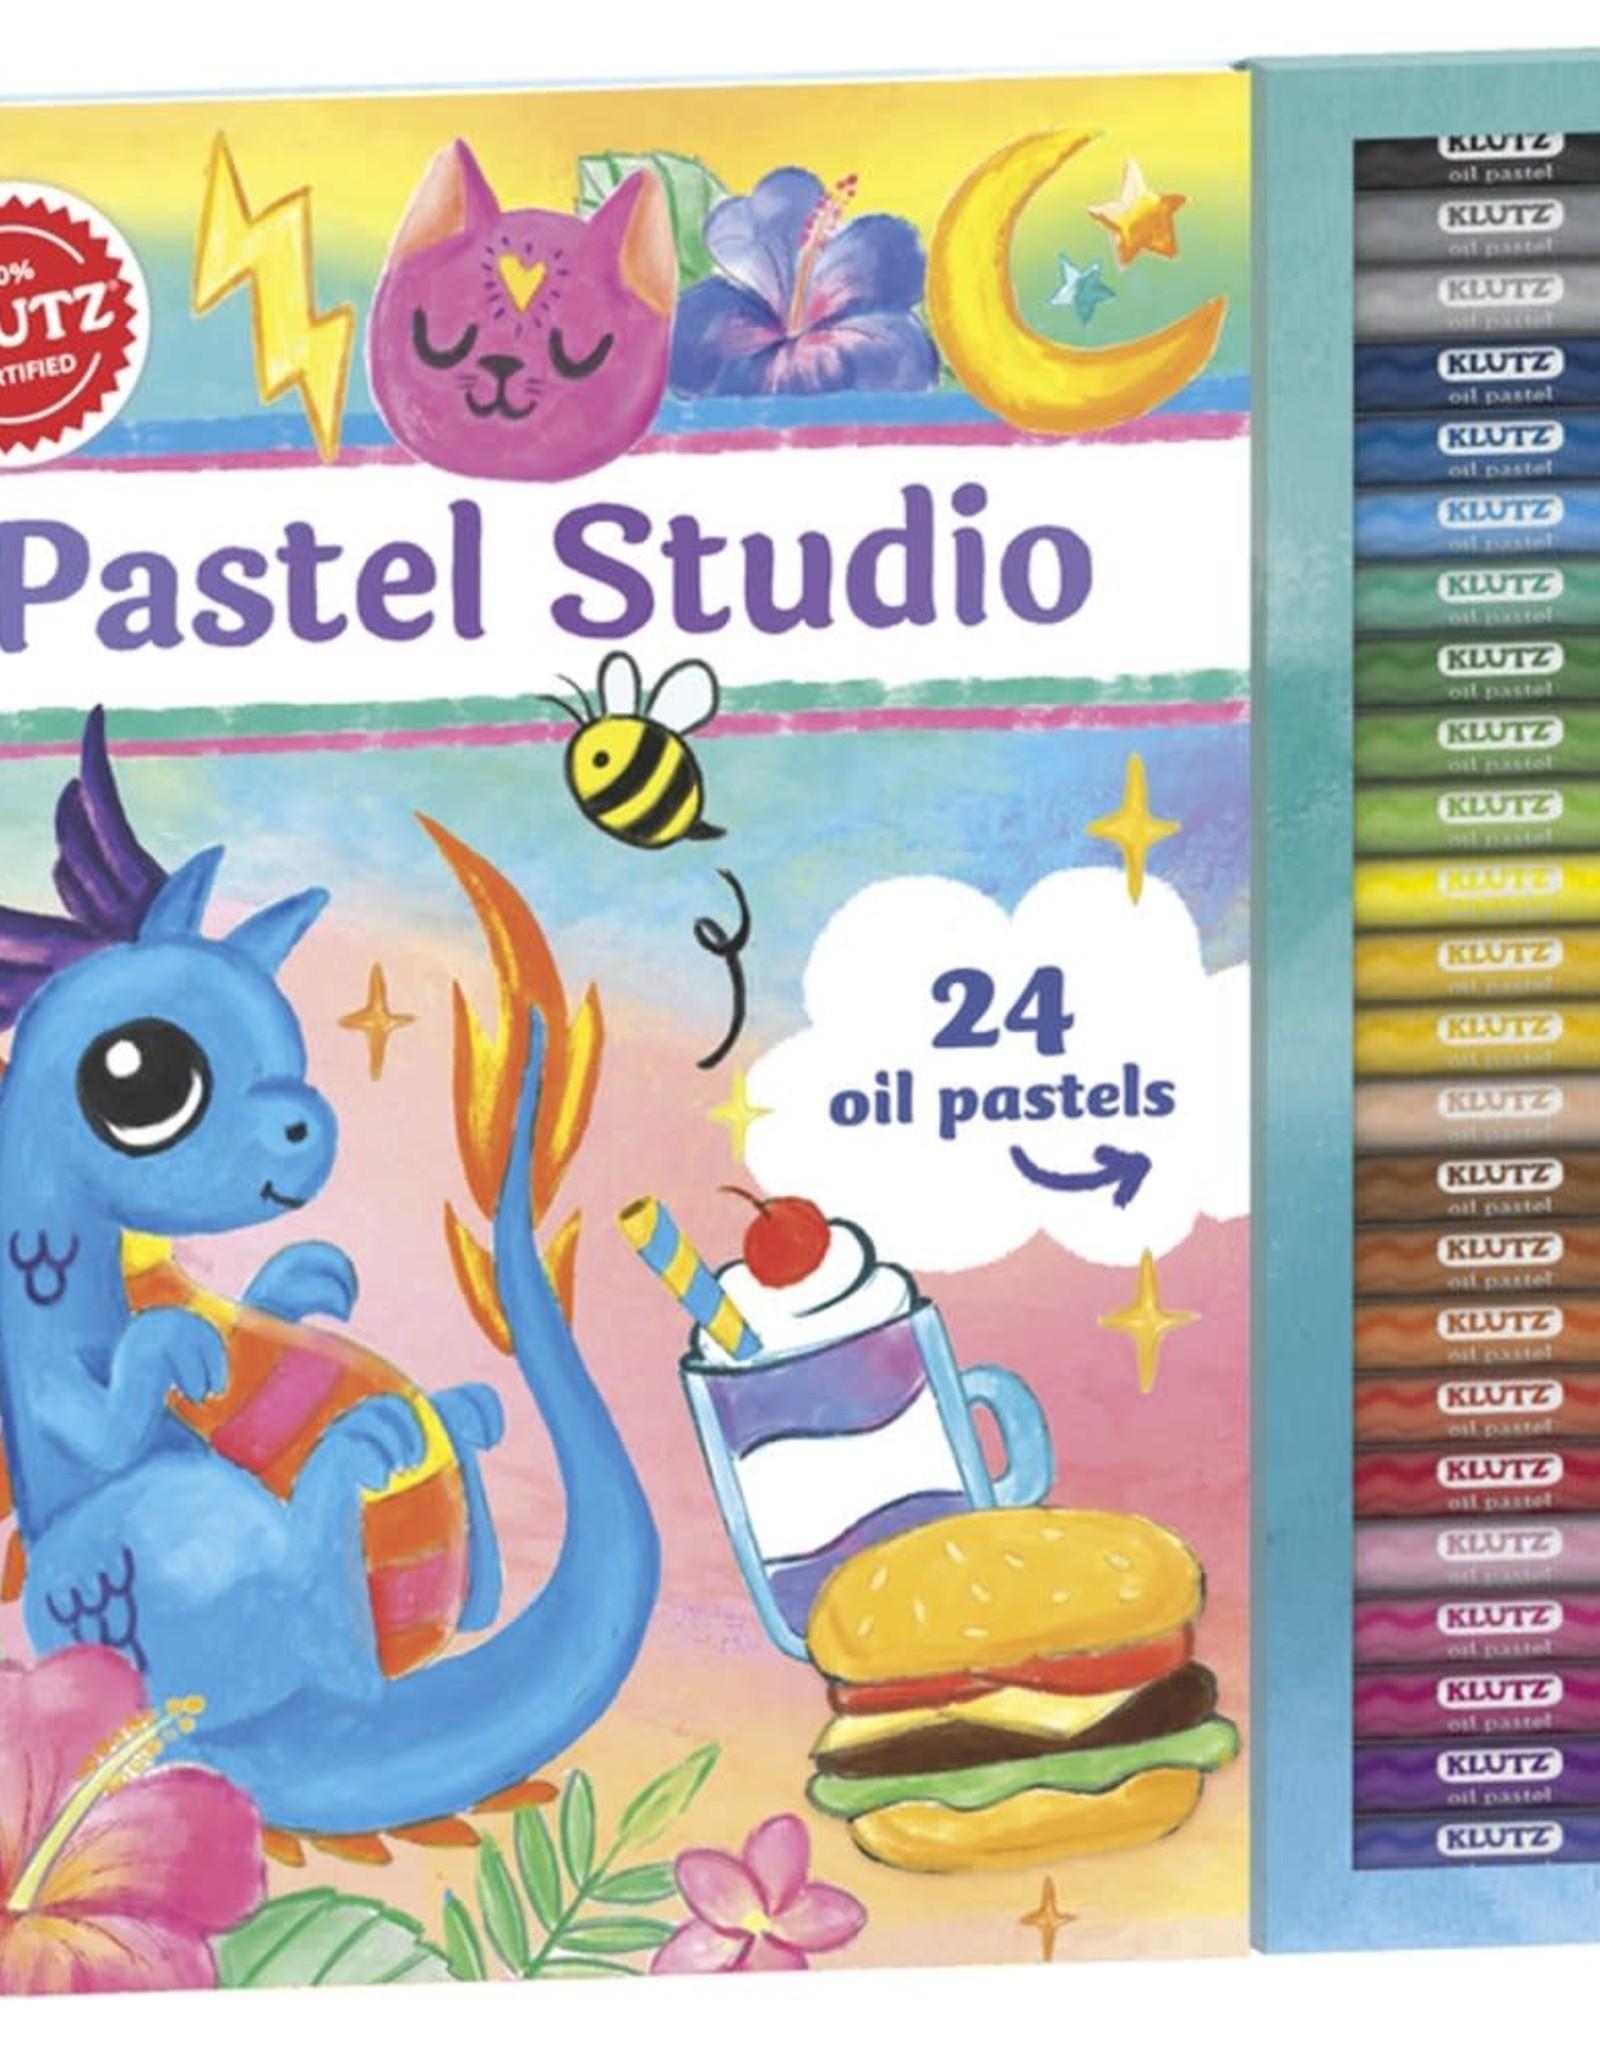 Pastel Studio